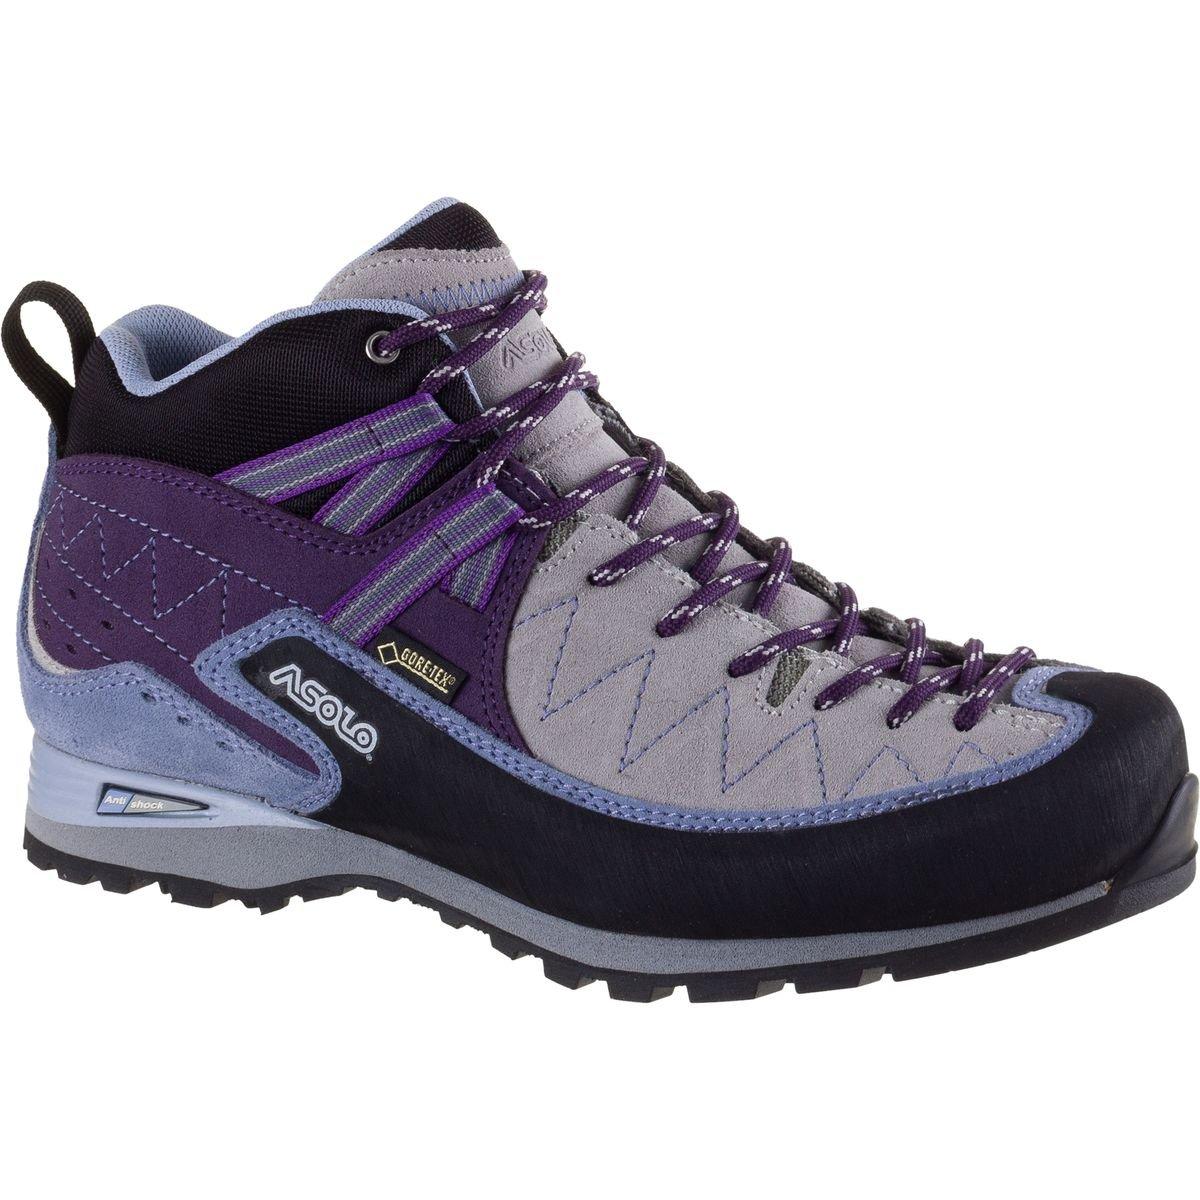 Asolo Jumla Hiking Boot - Women's Silver/Lilac, 9.0